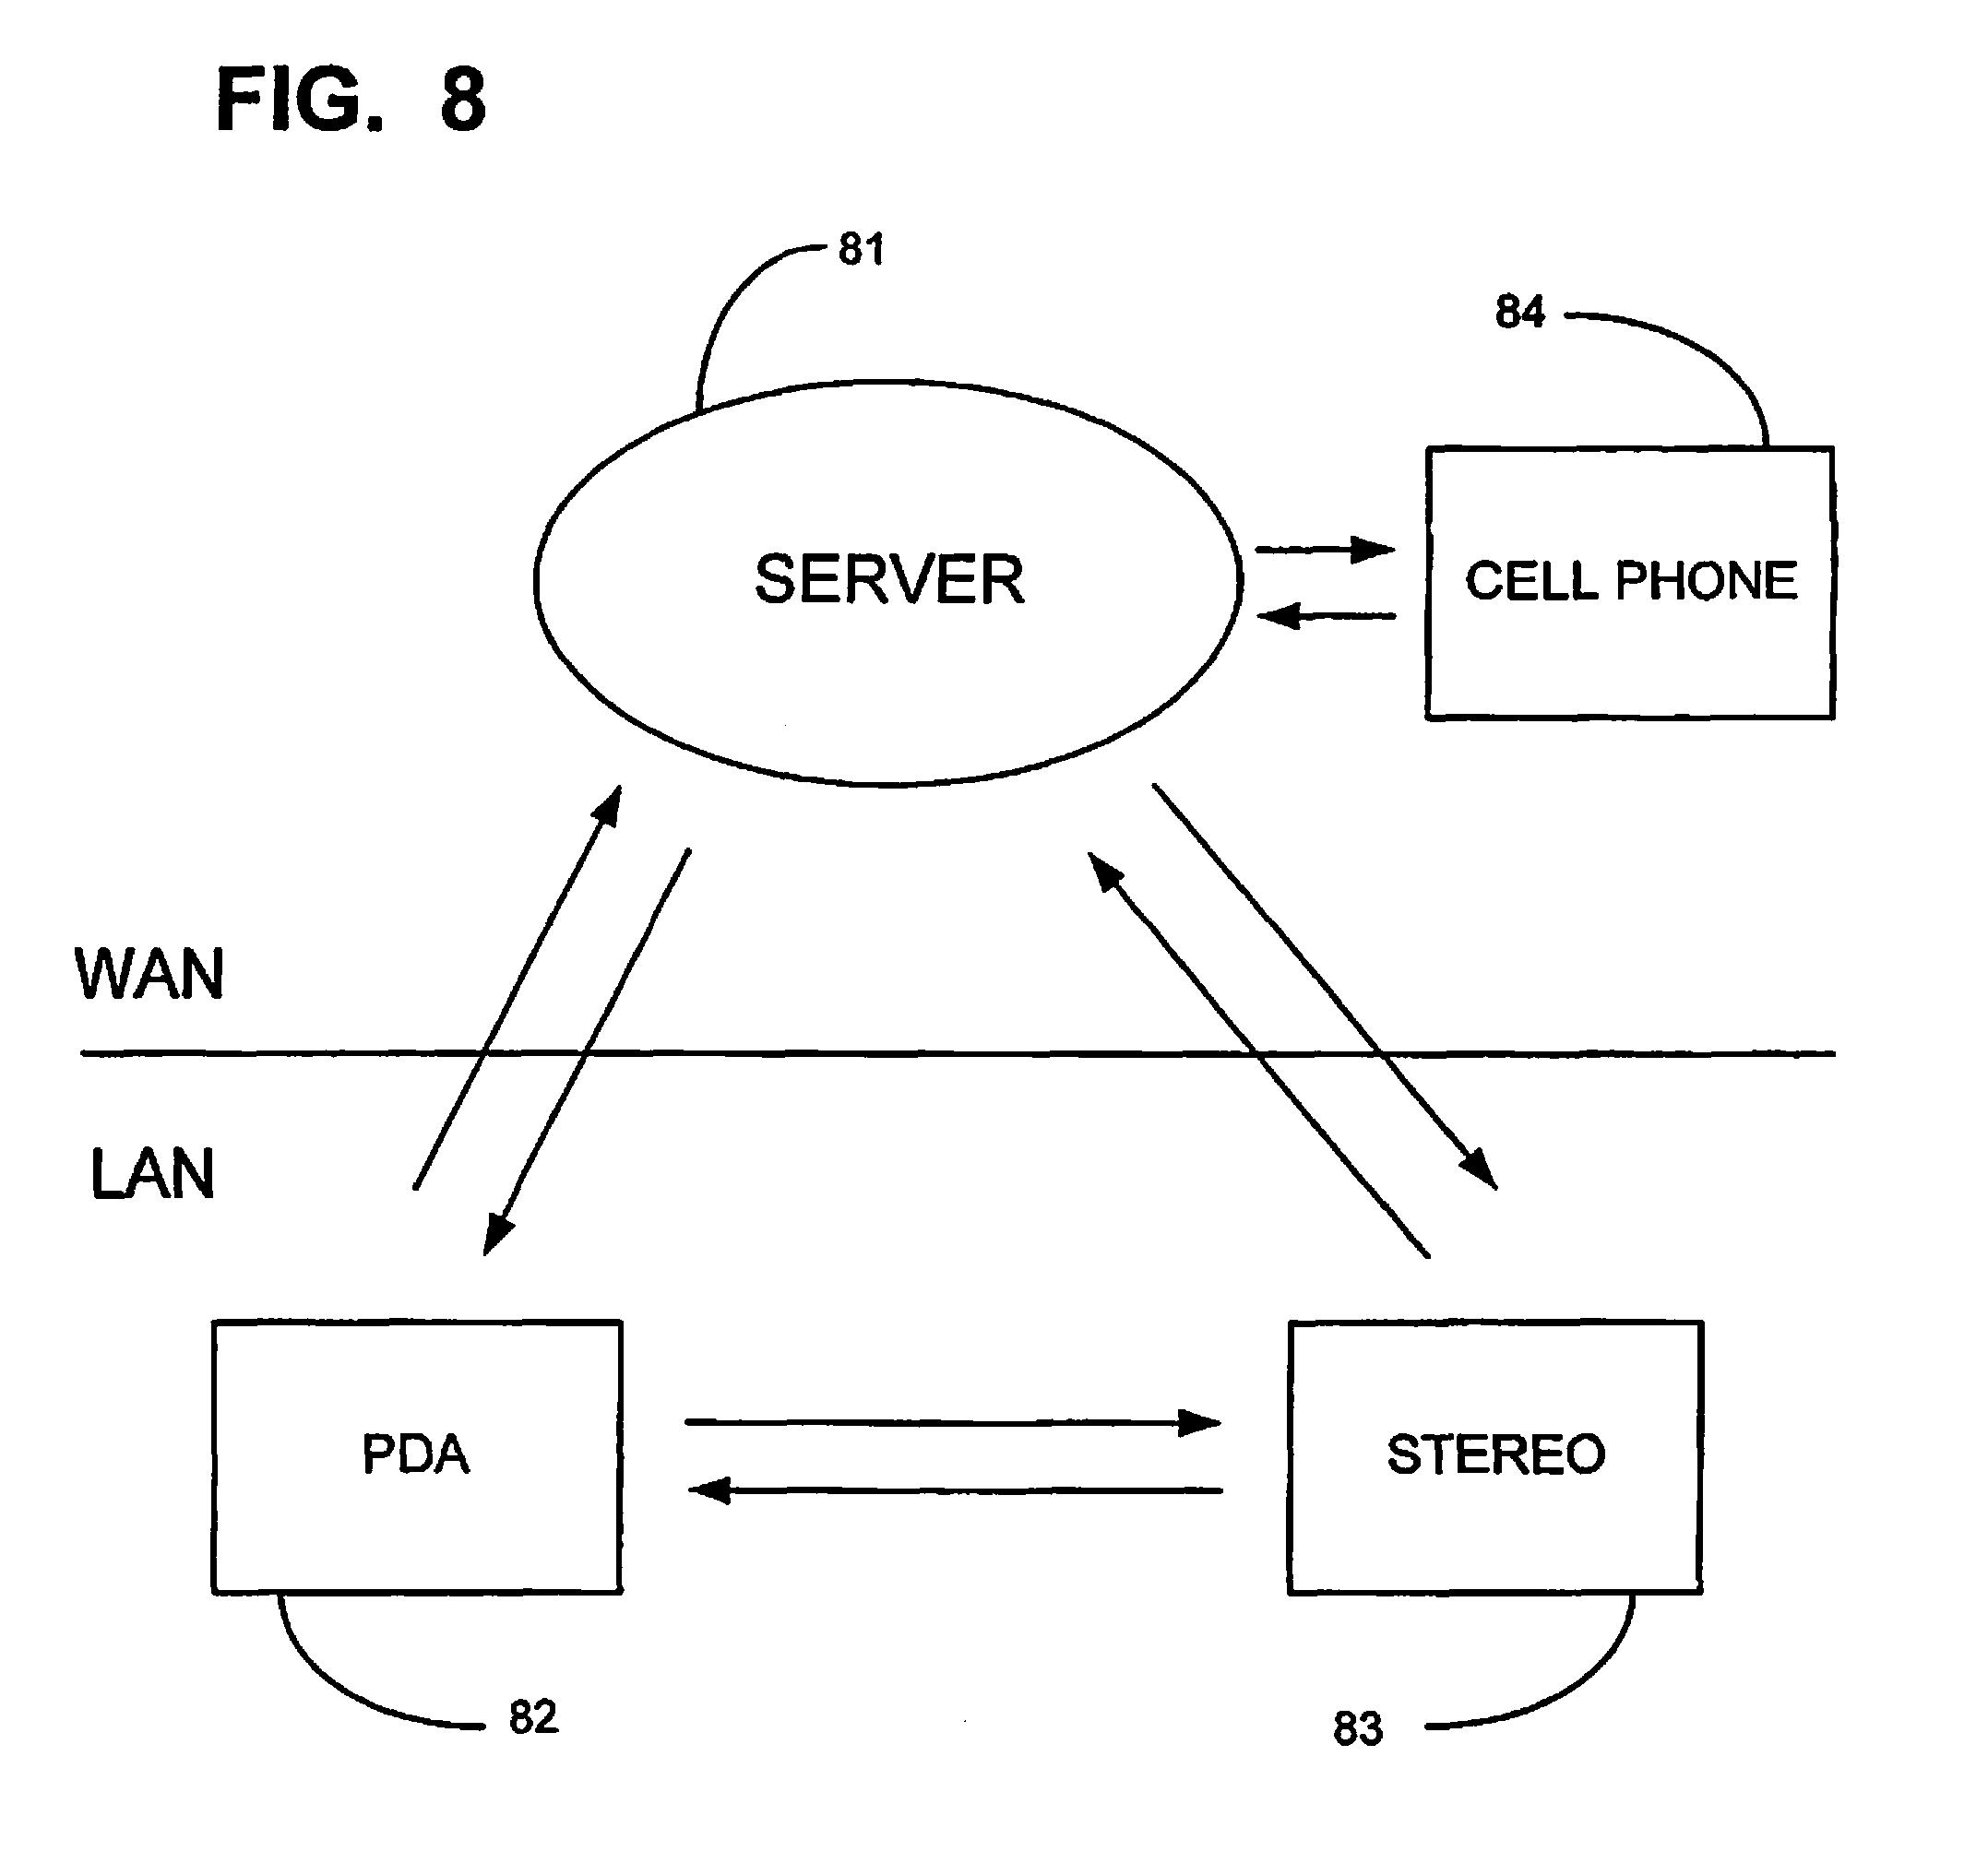 Patent US 9,516,370 B1